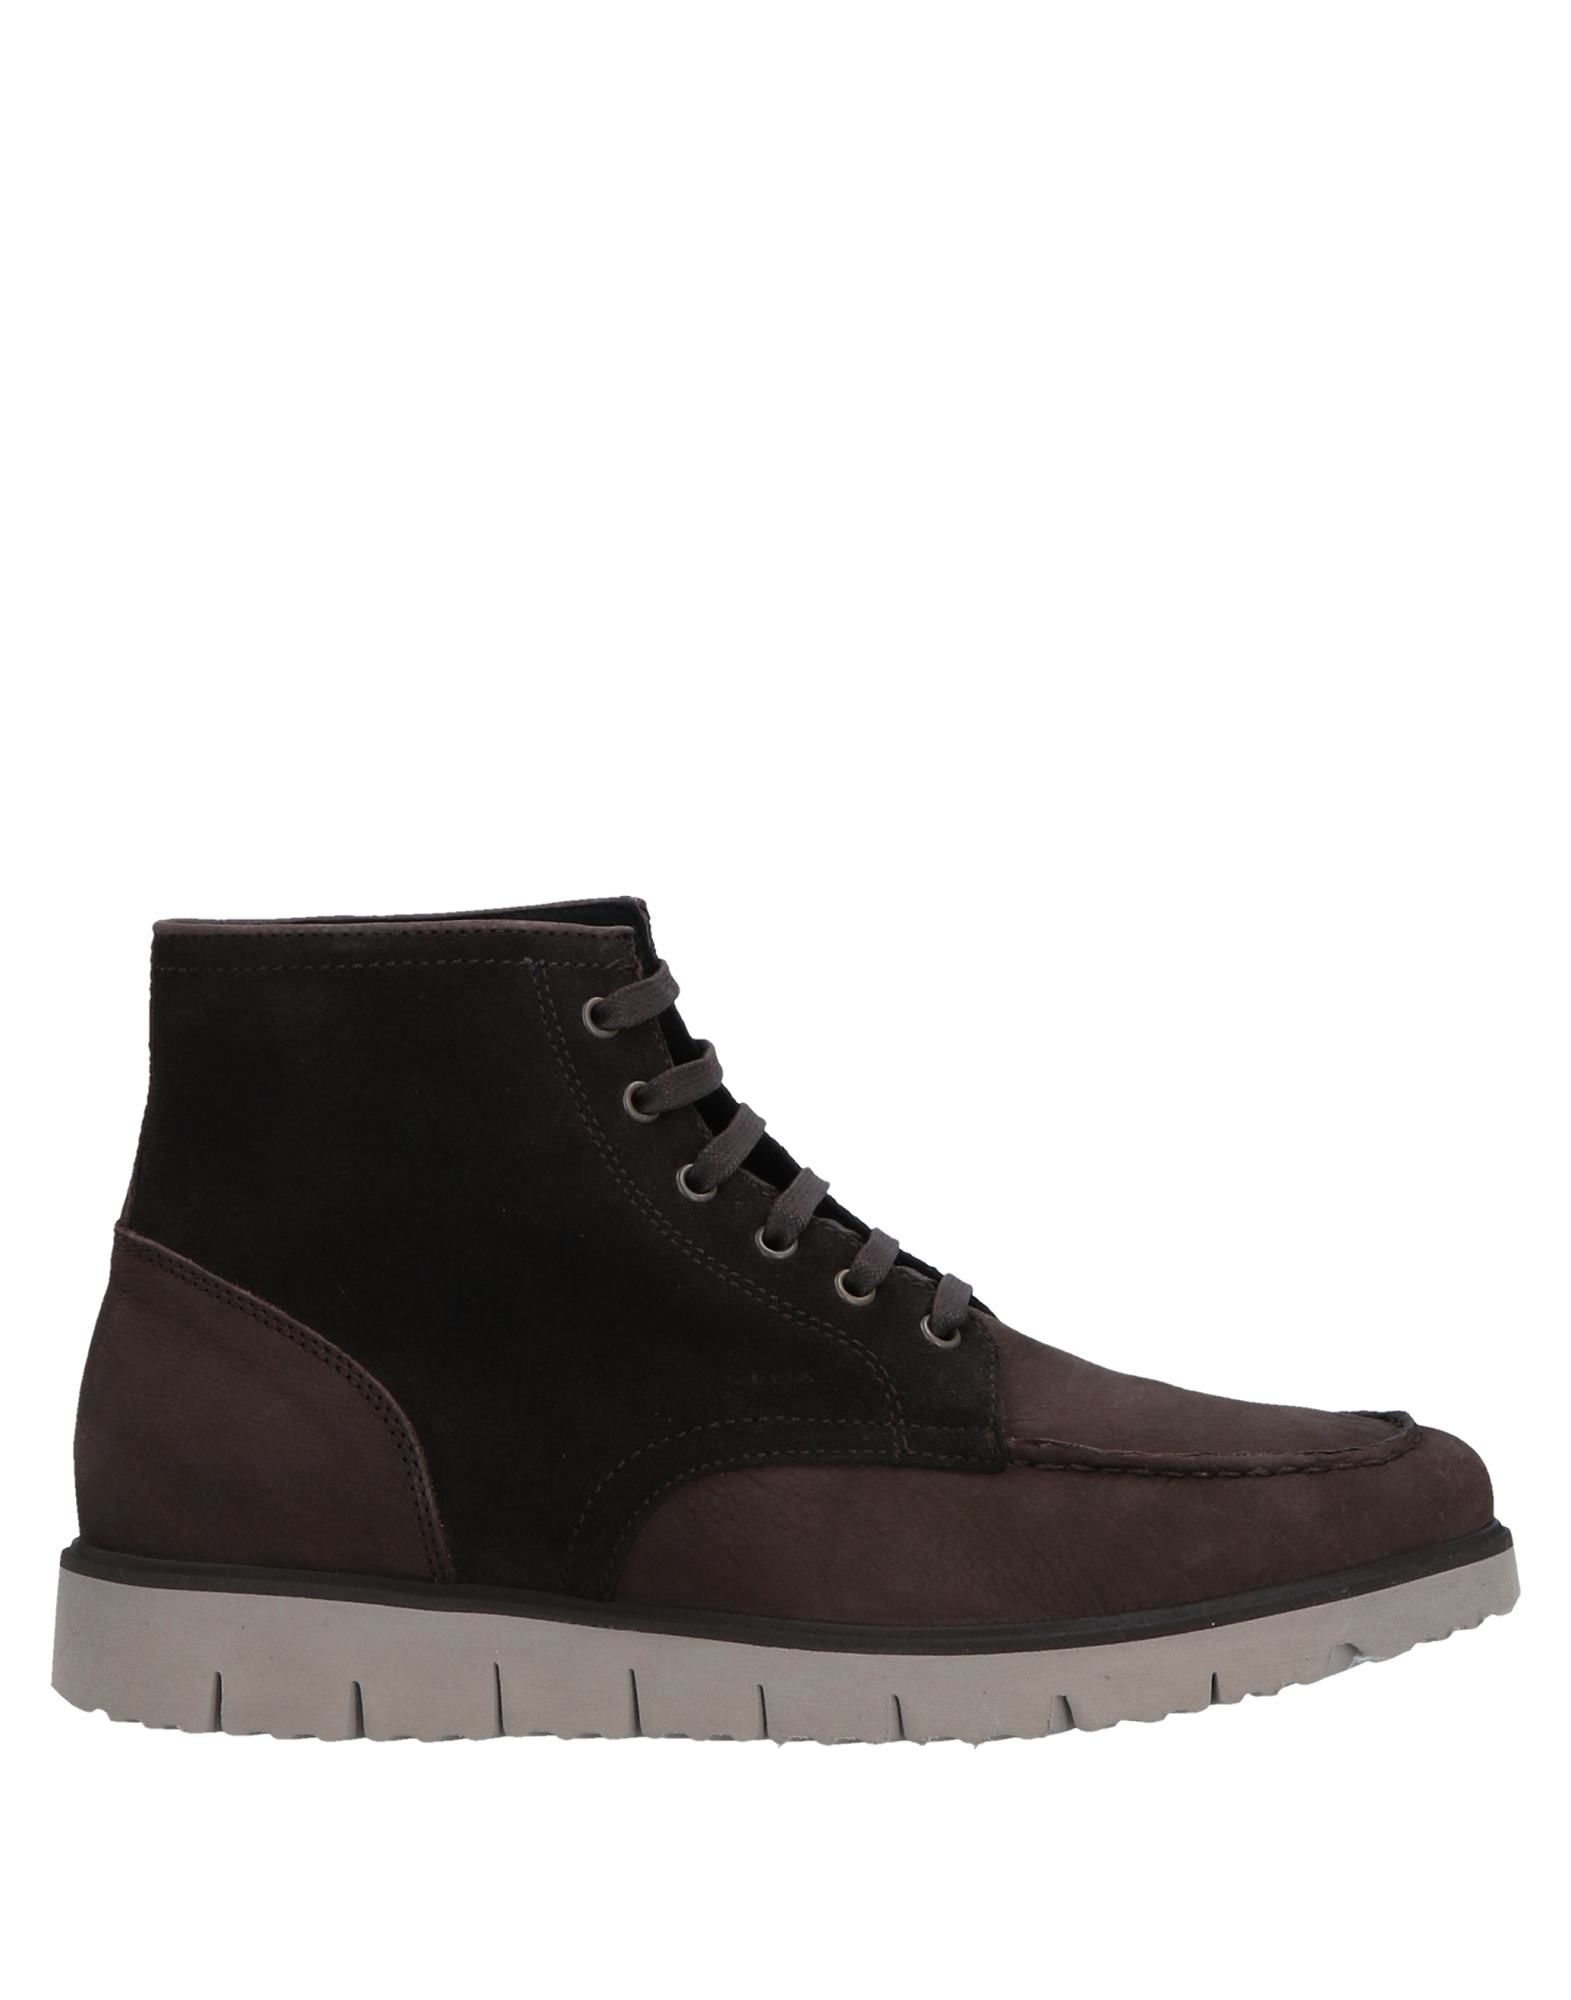 Rabatt echte  Schuhe Geox Stiefelette Herren  echte 11540412RA 93e5c4